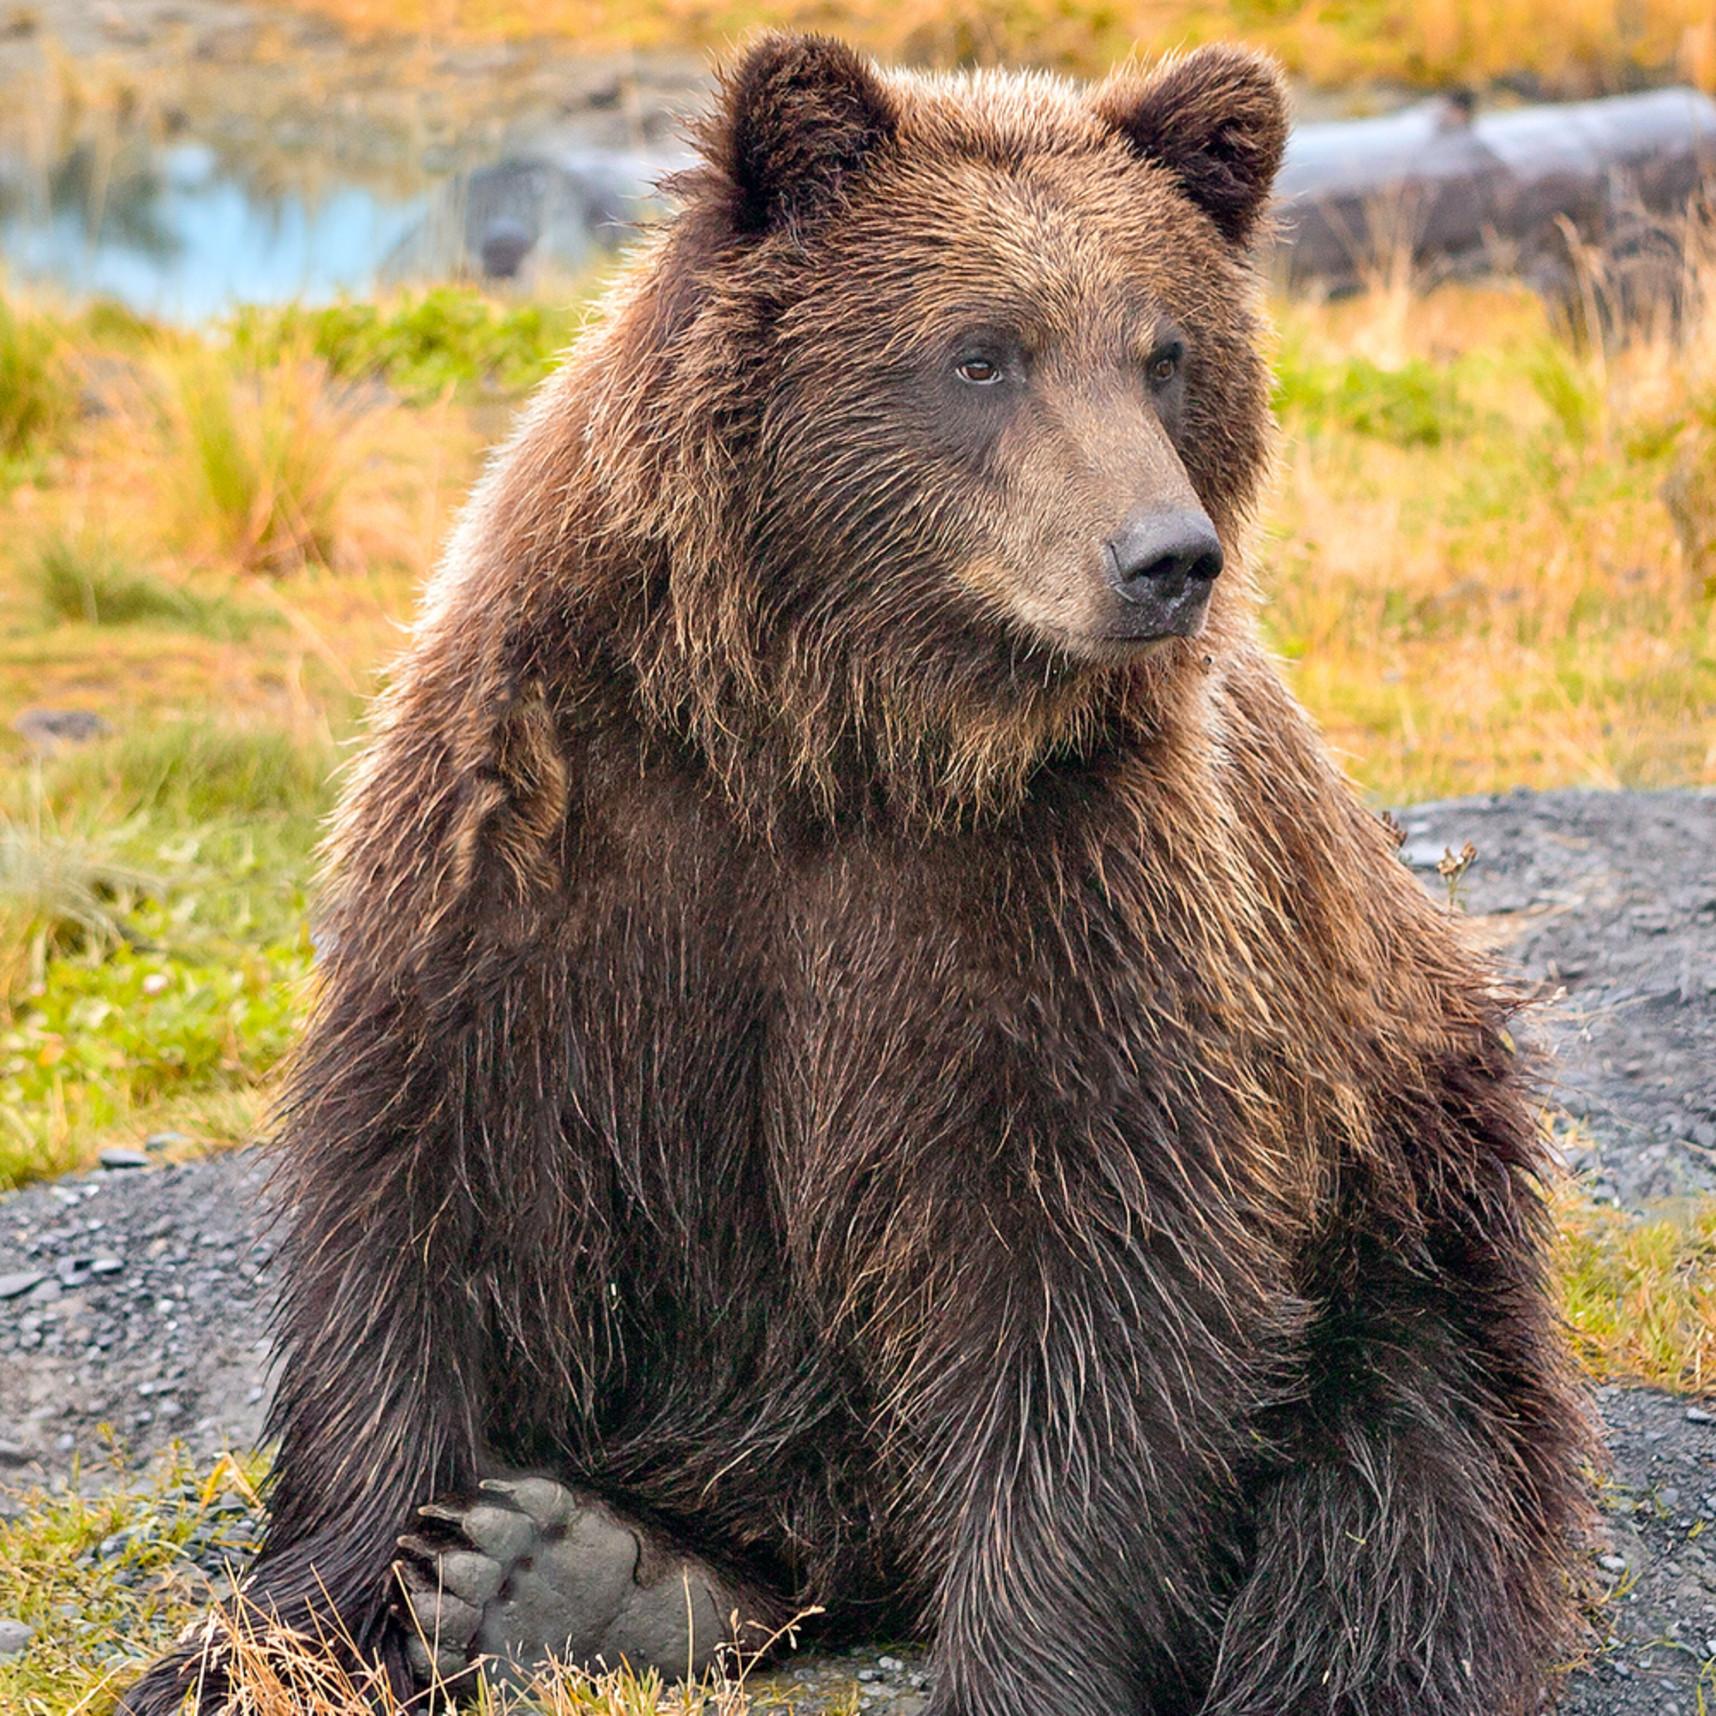 Bear yearling moqmep